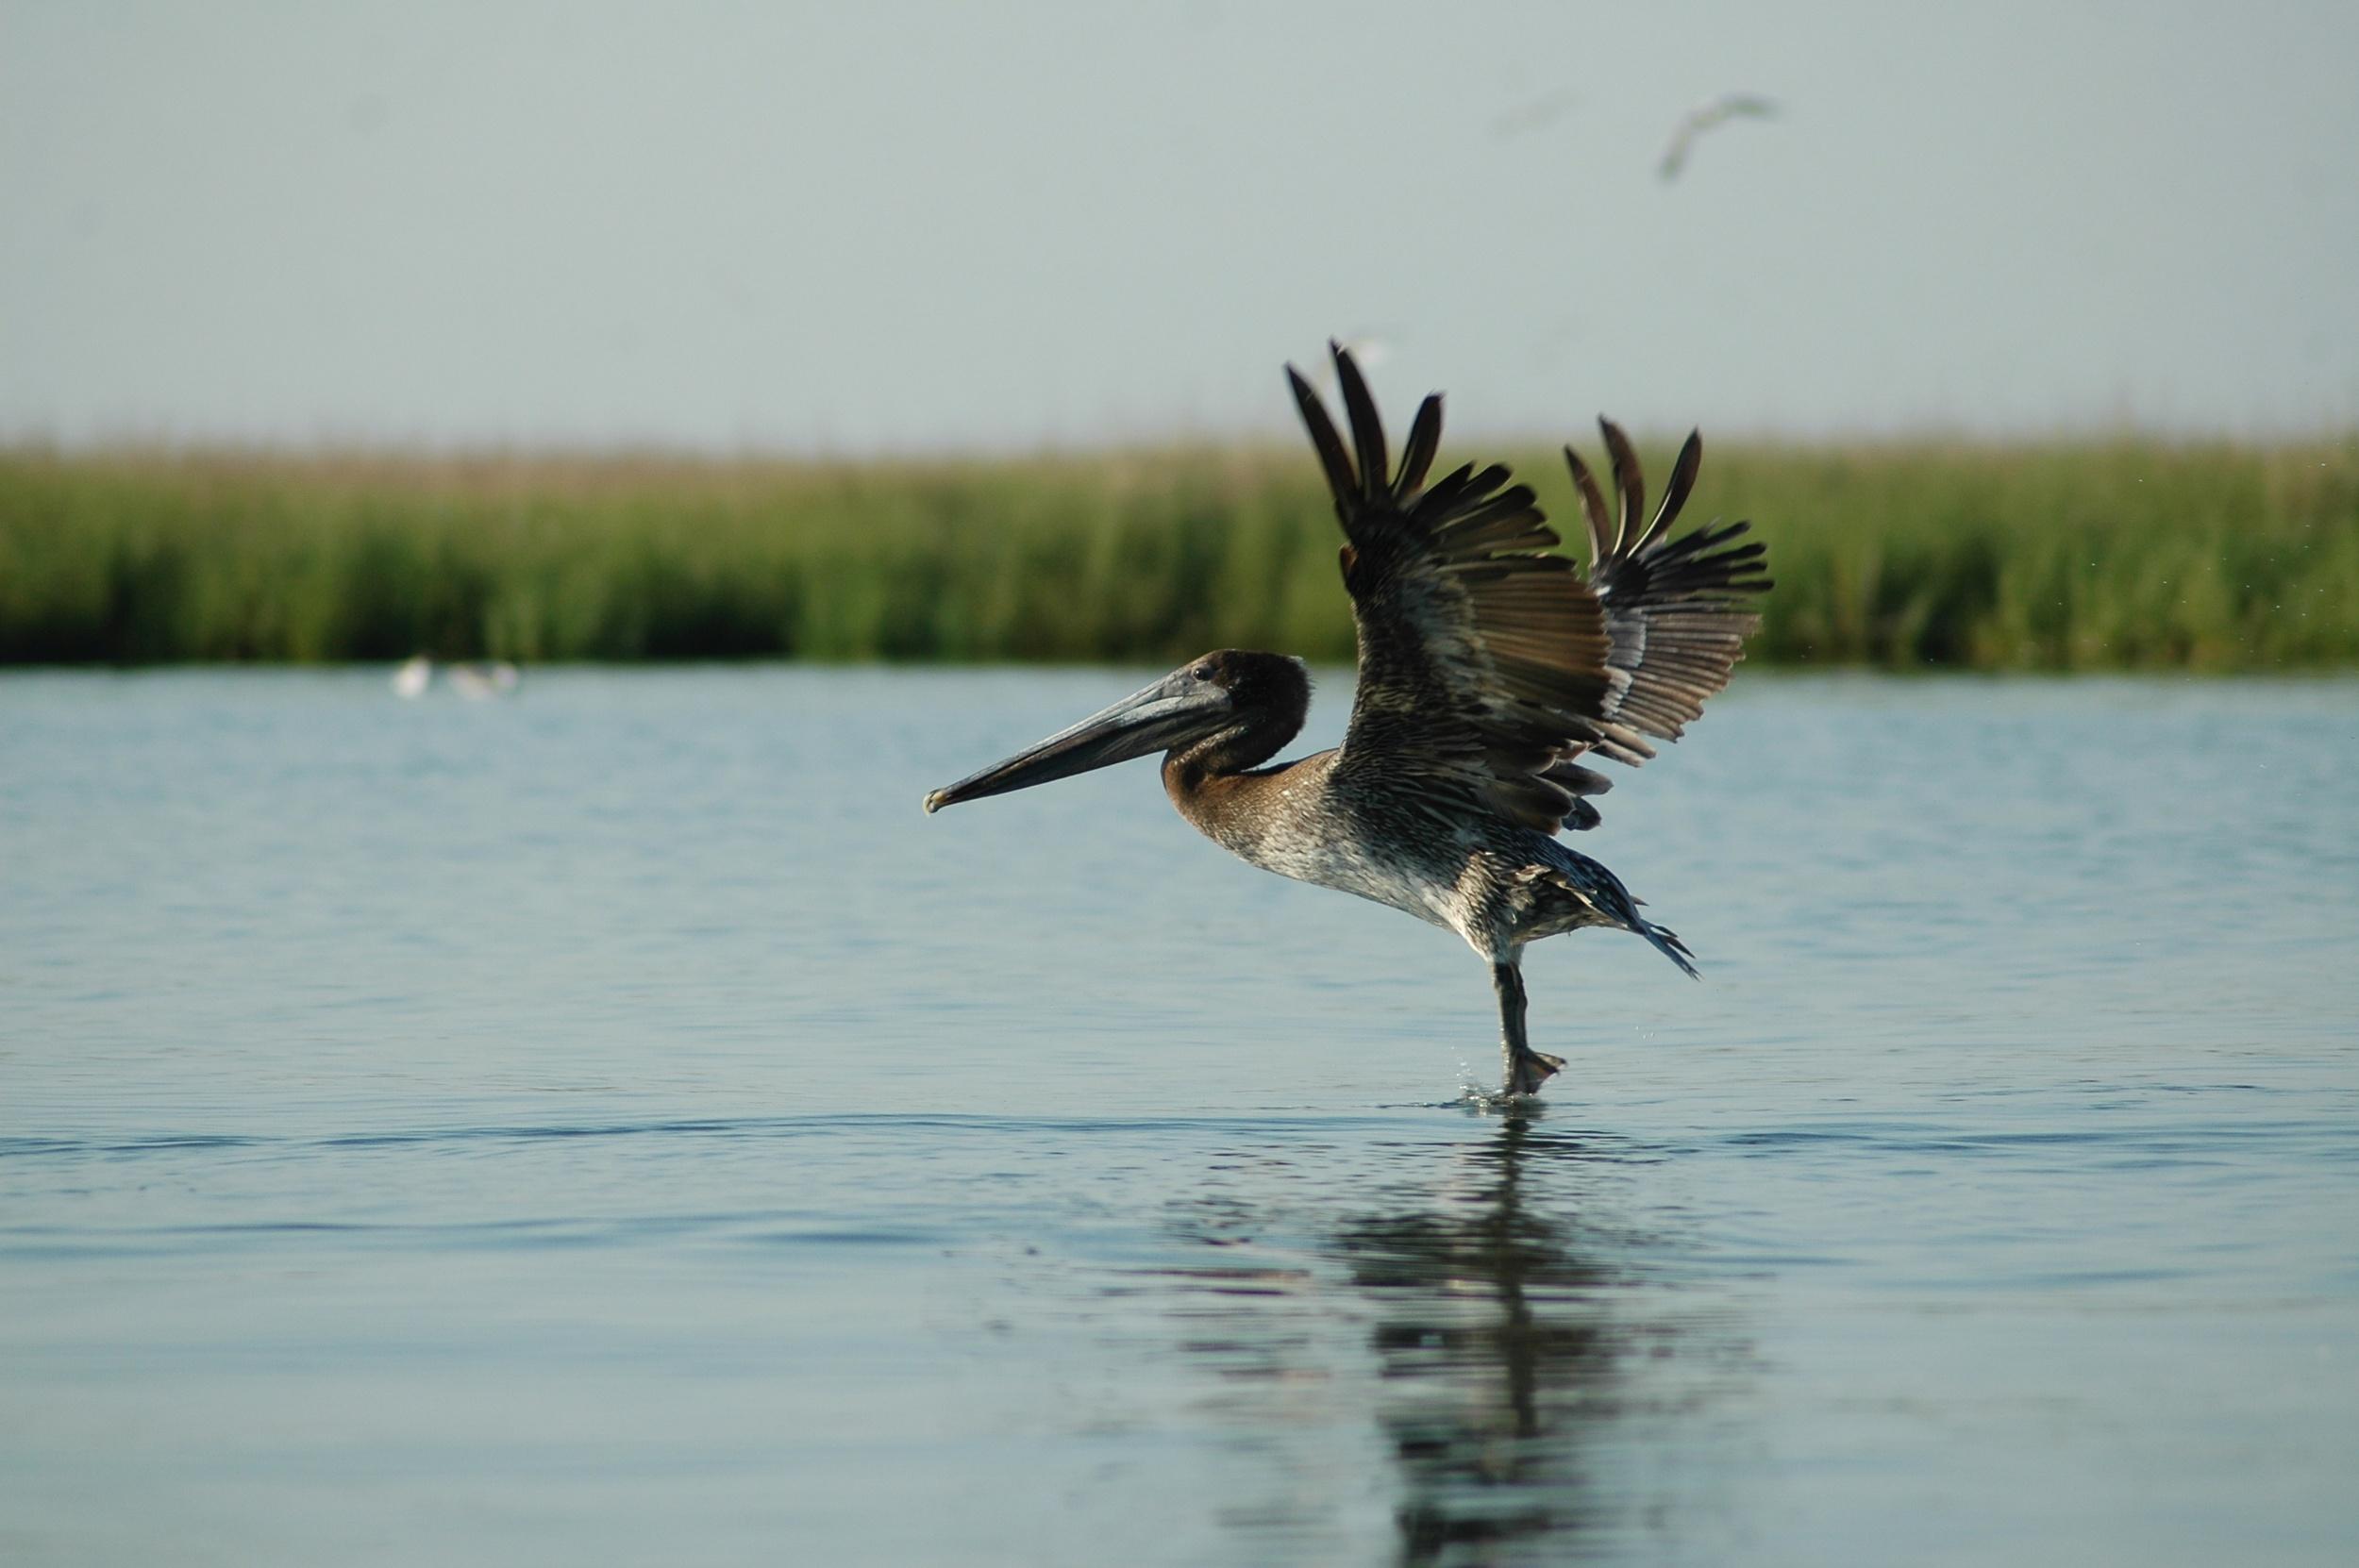 On Delmarva: Brown Pelican taking flight